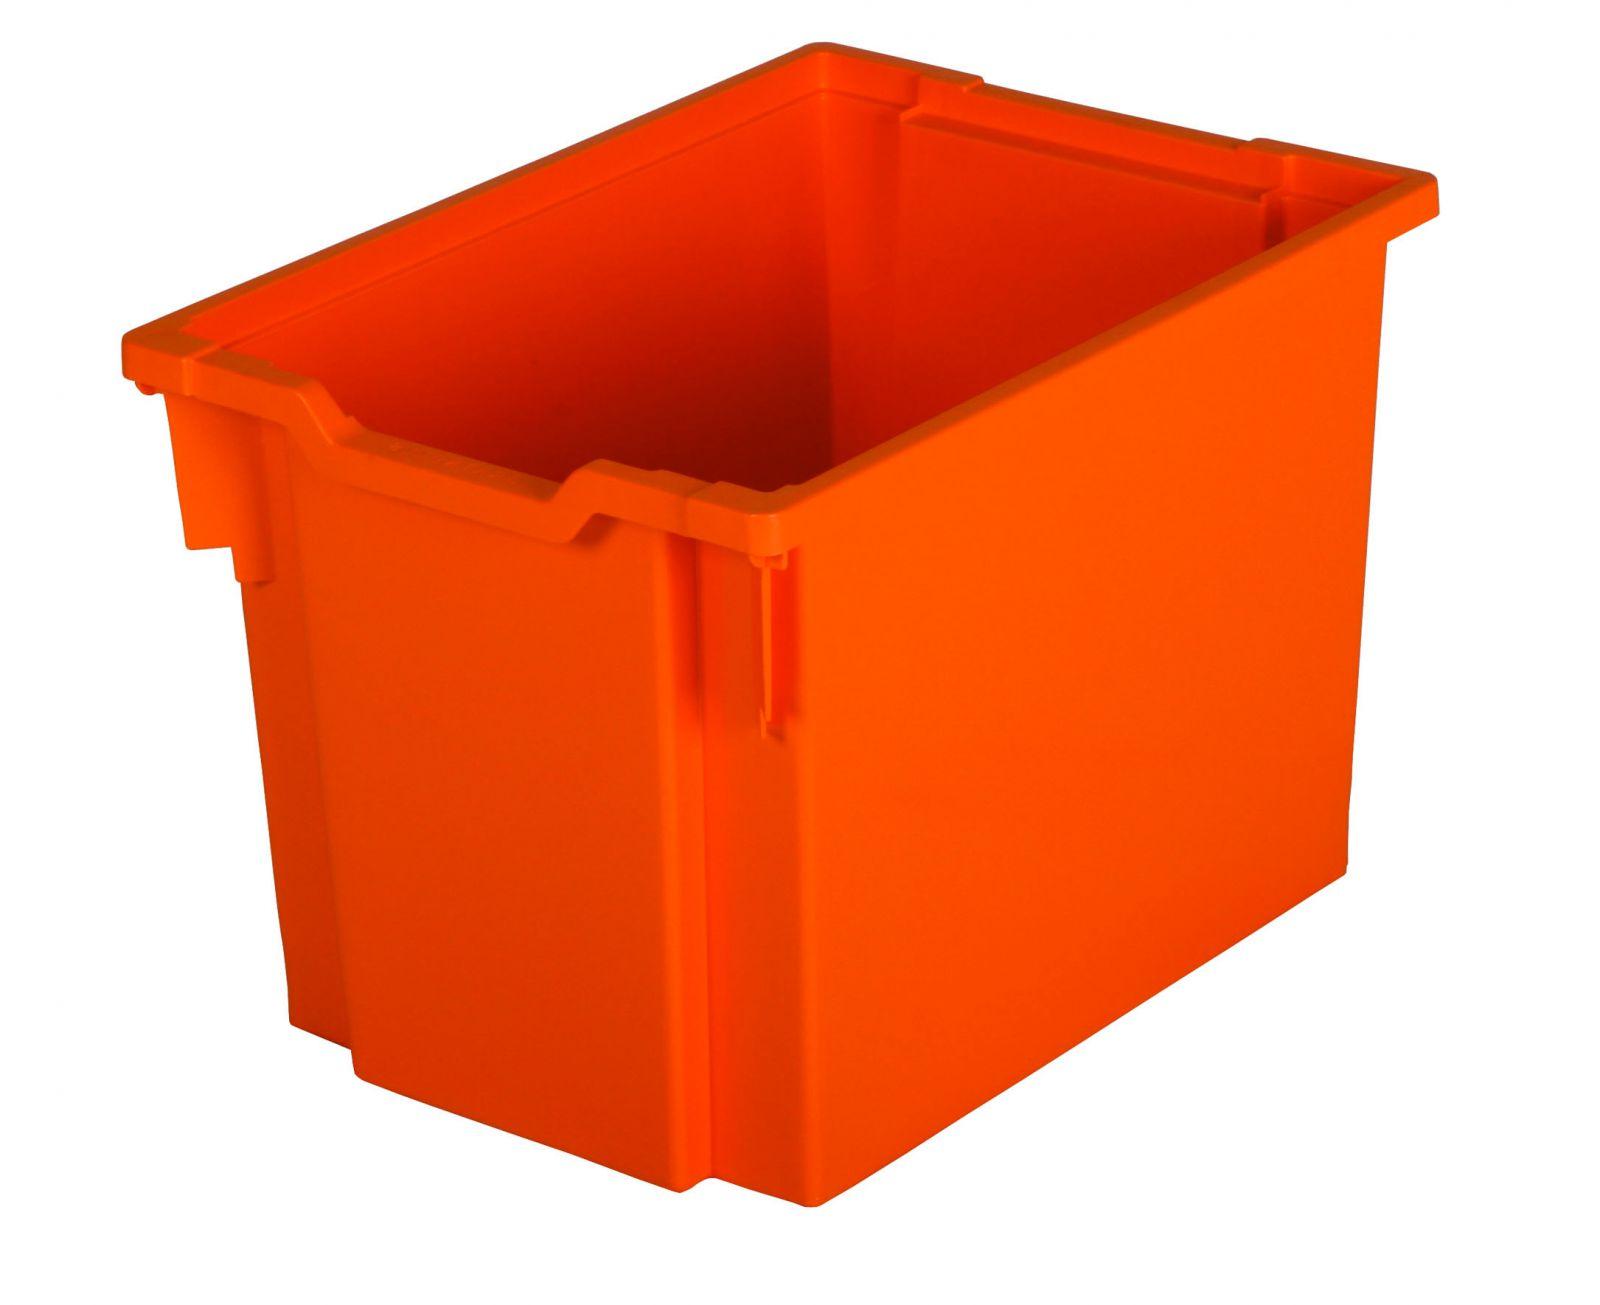 Zásuvka plast JUMBO - oranžová Gratnells